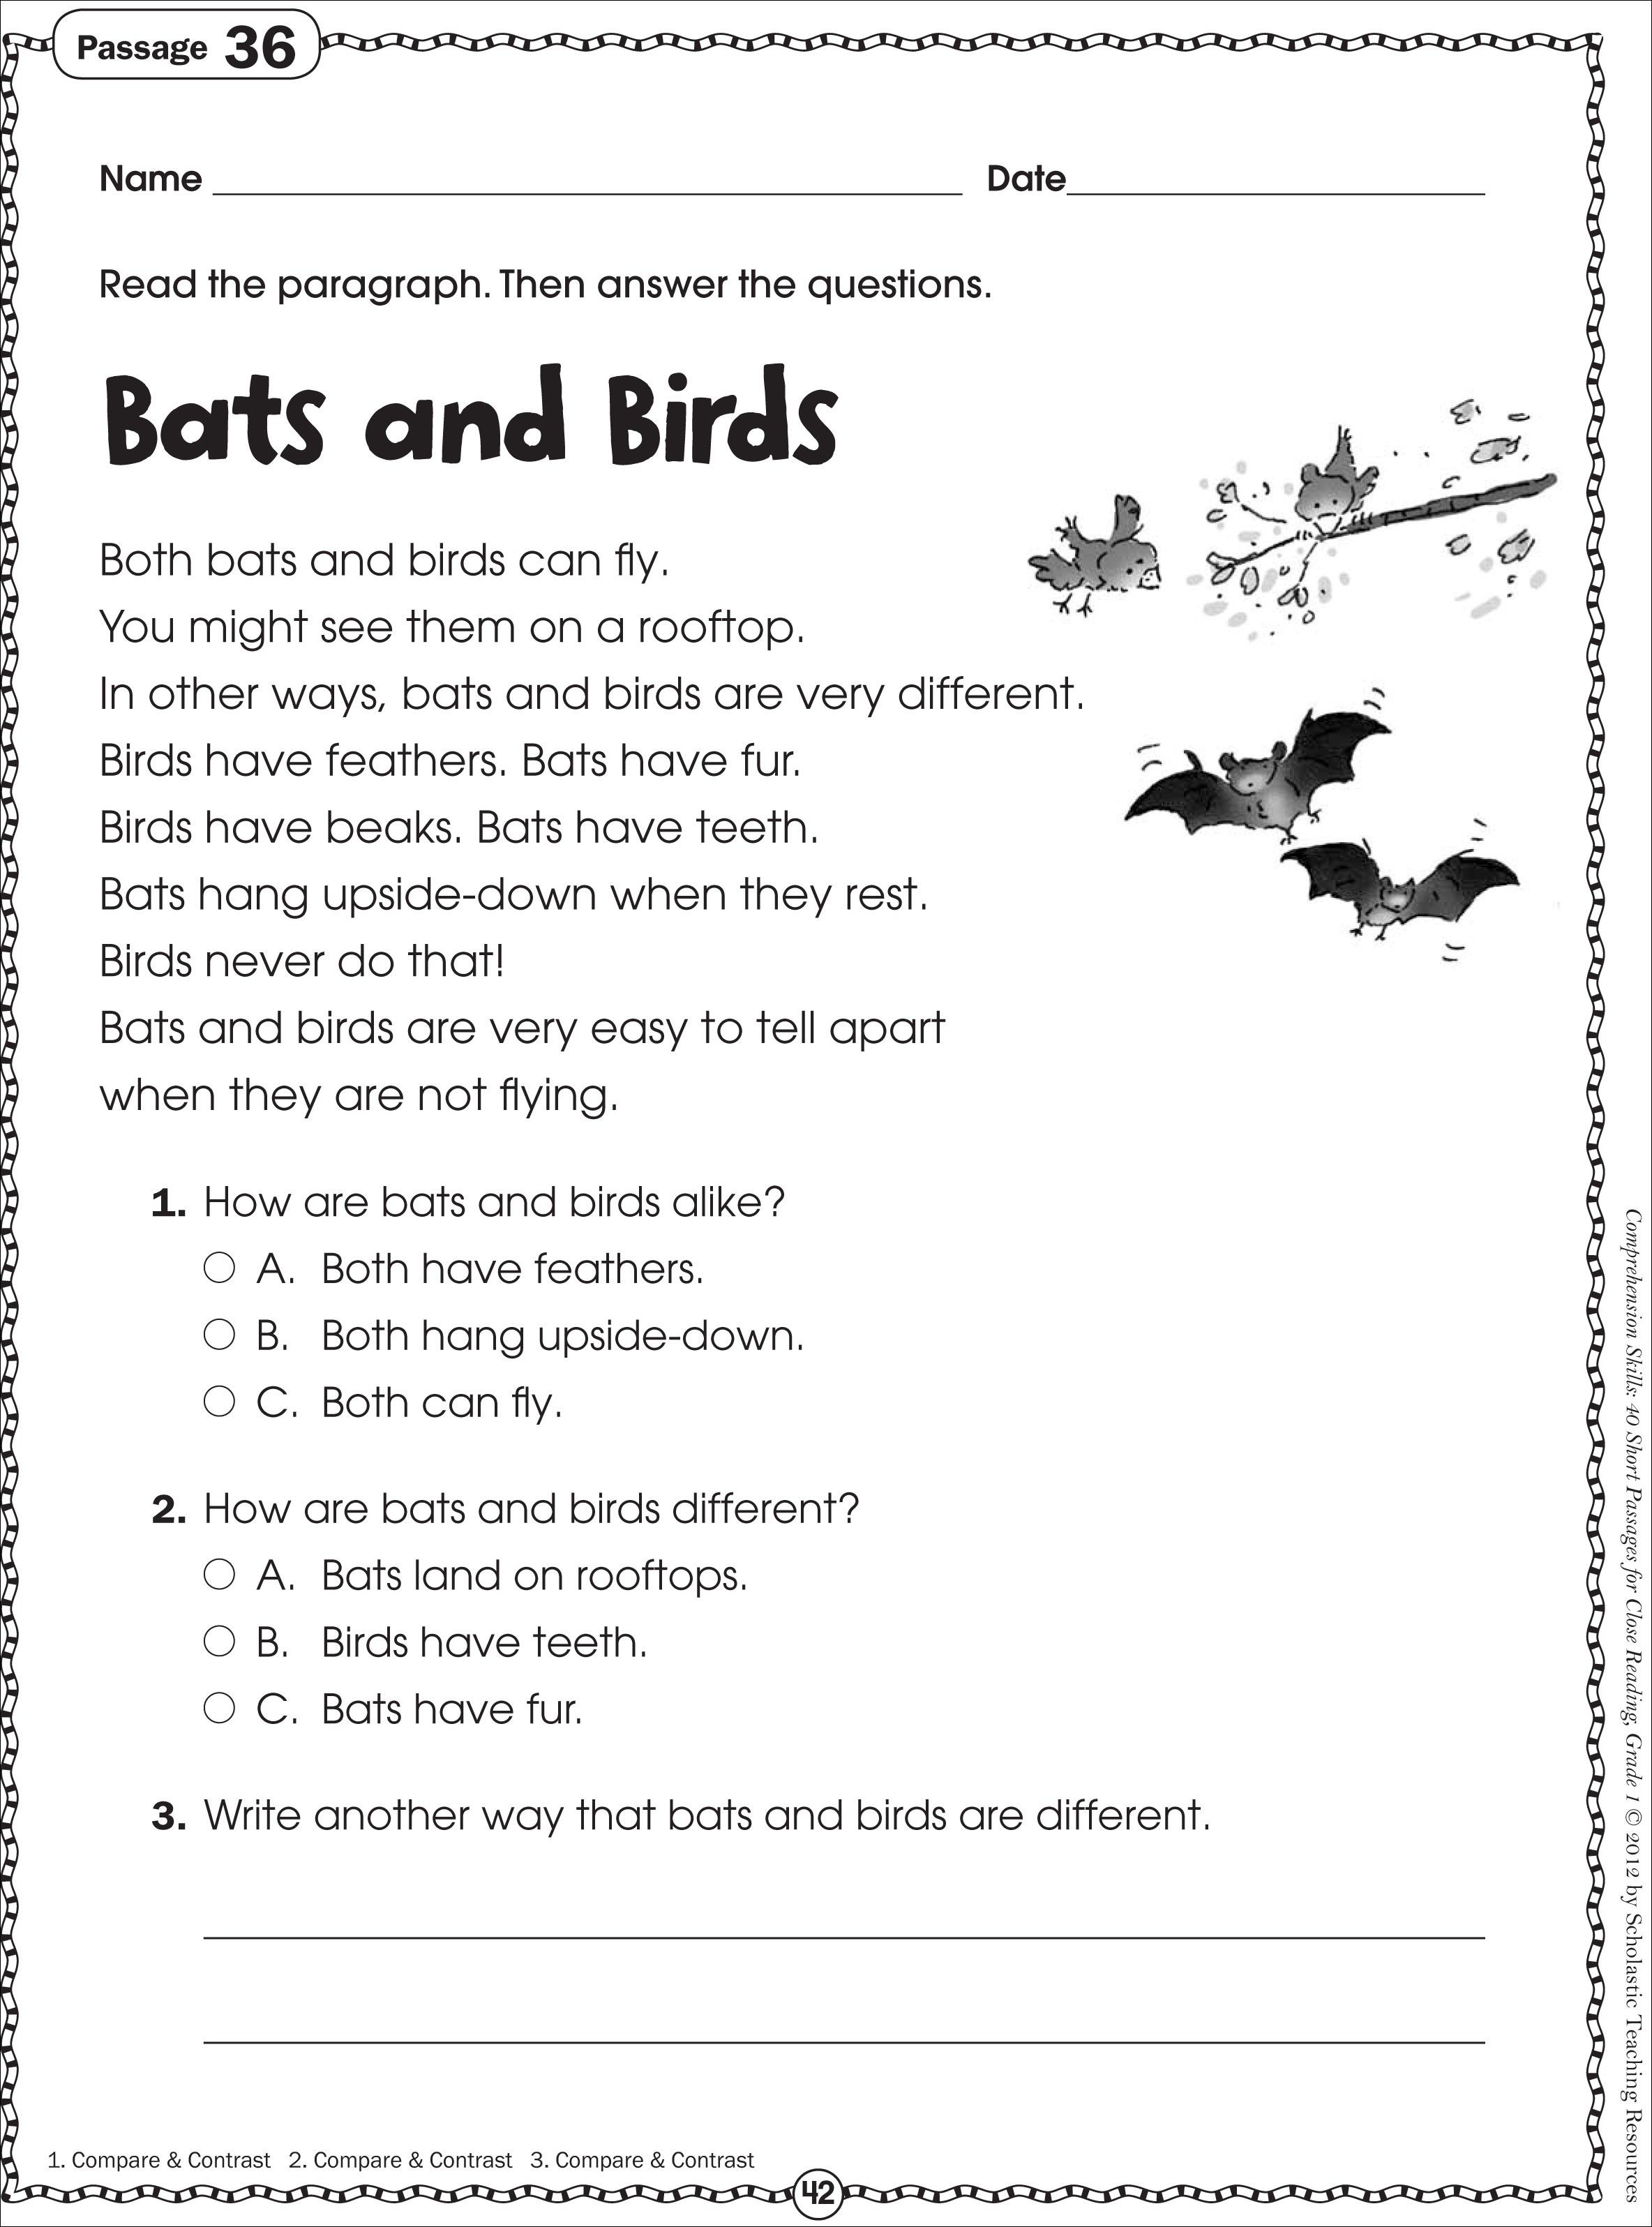 Free Printable Reading Comprehension Worksheets For Kindergarten - Free Printable Reading Comprehension Worksheets For Adults